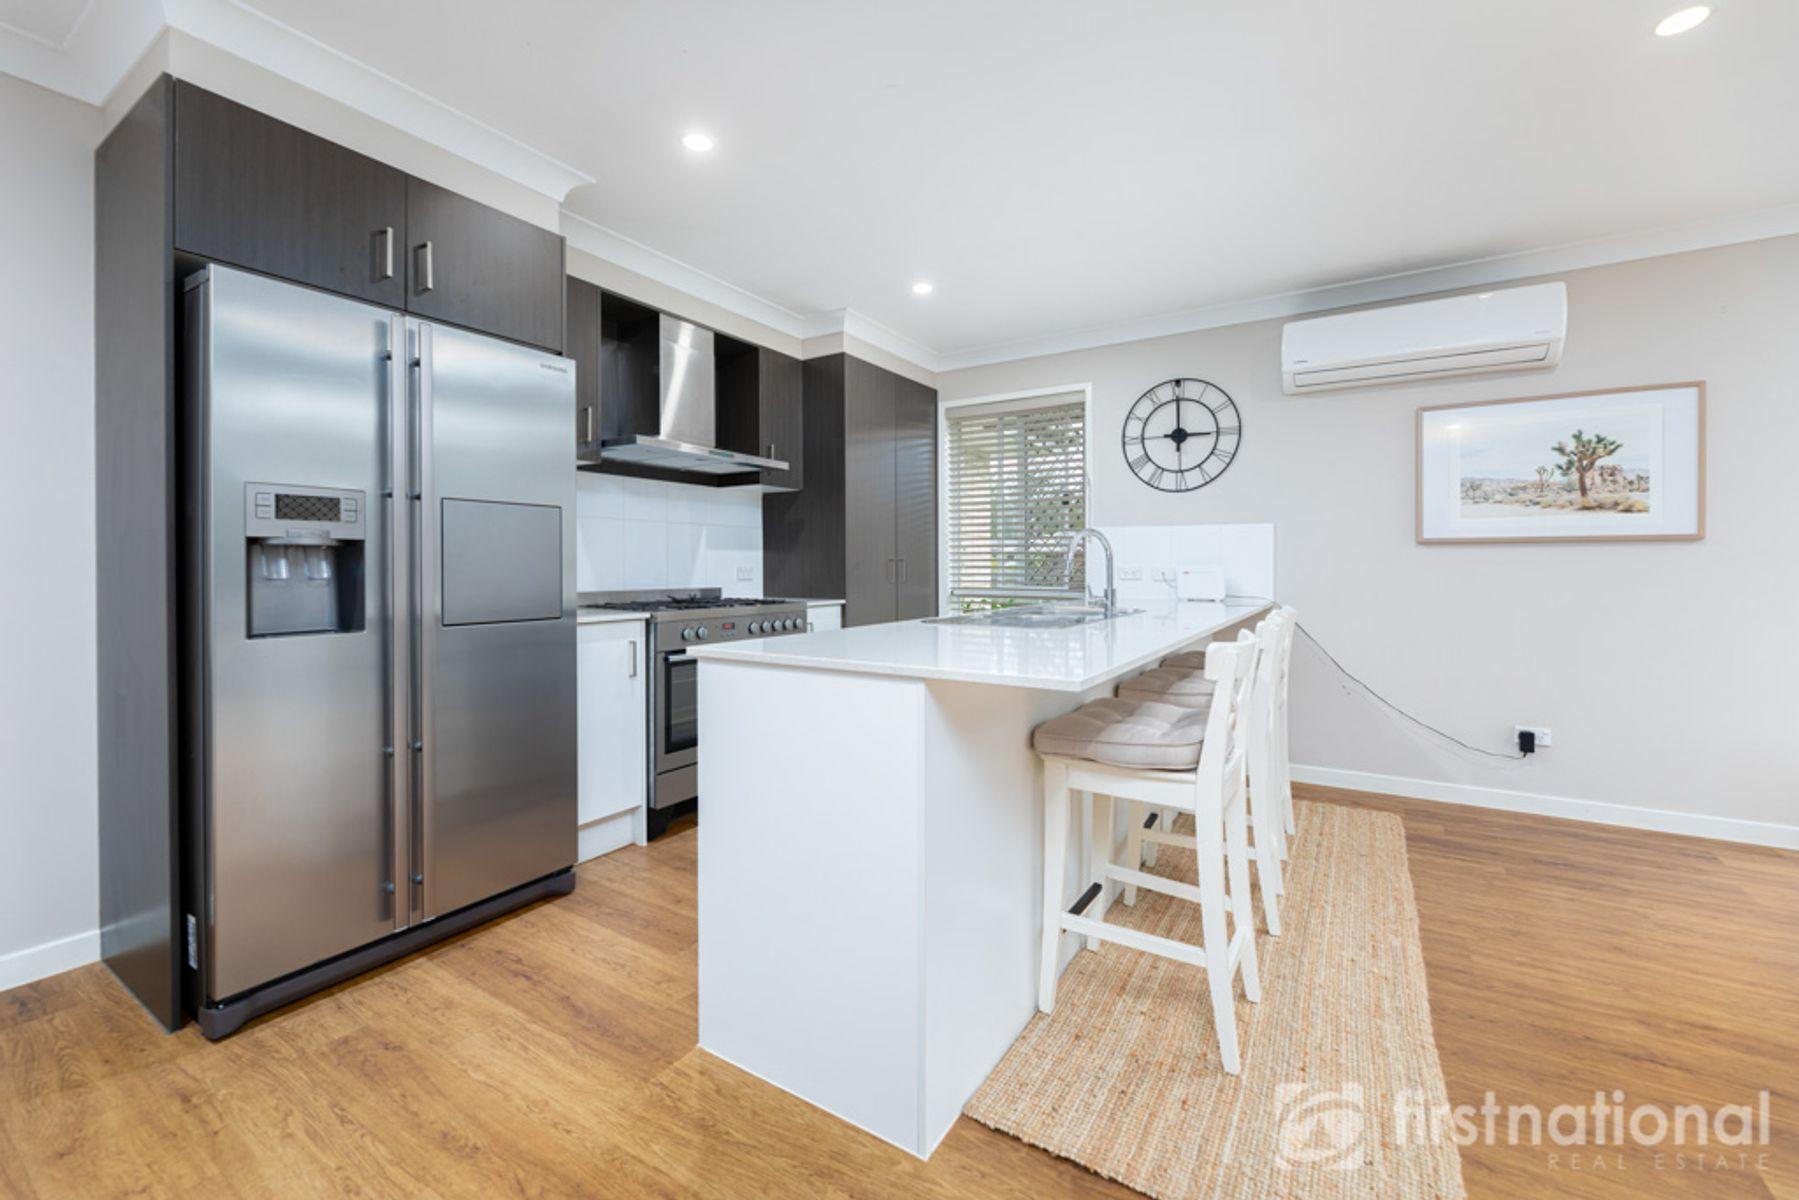 10 Mellumbrook Drive, Landsborough, QLD 4550